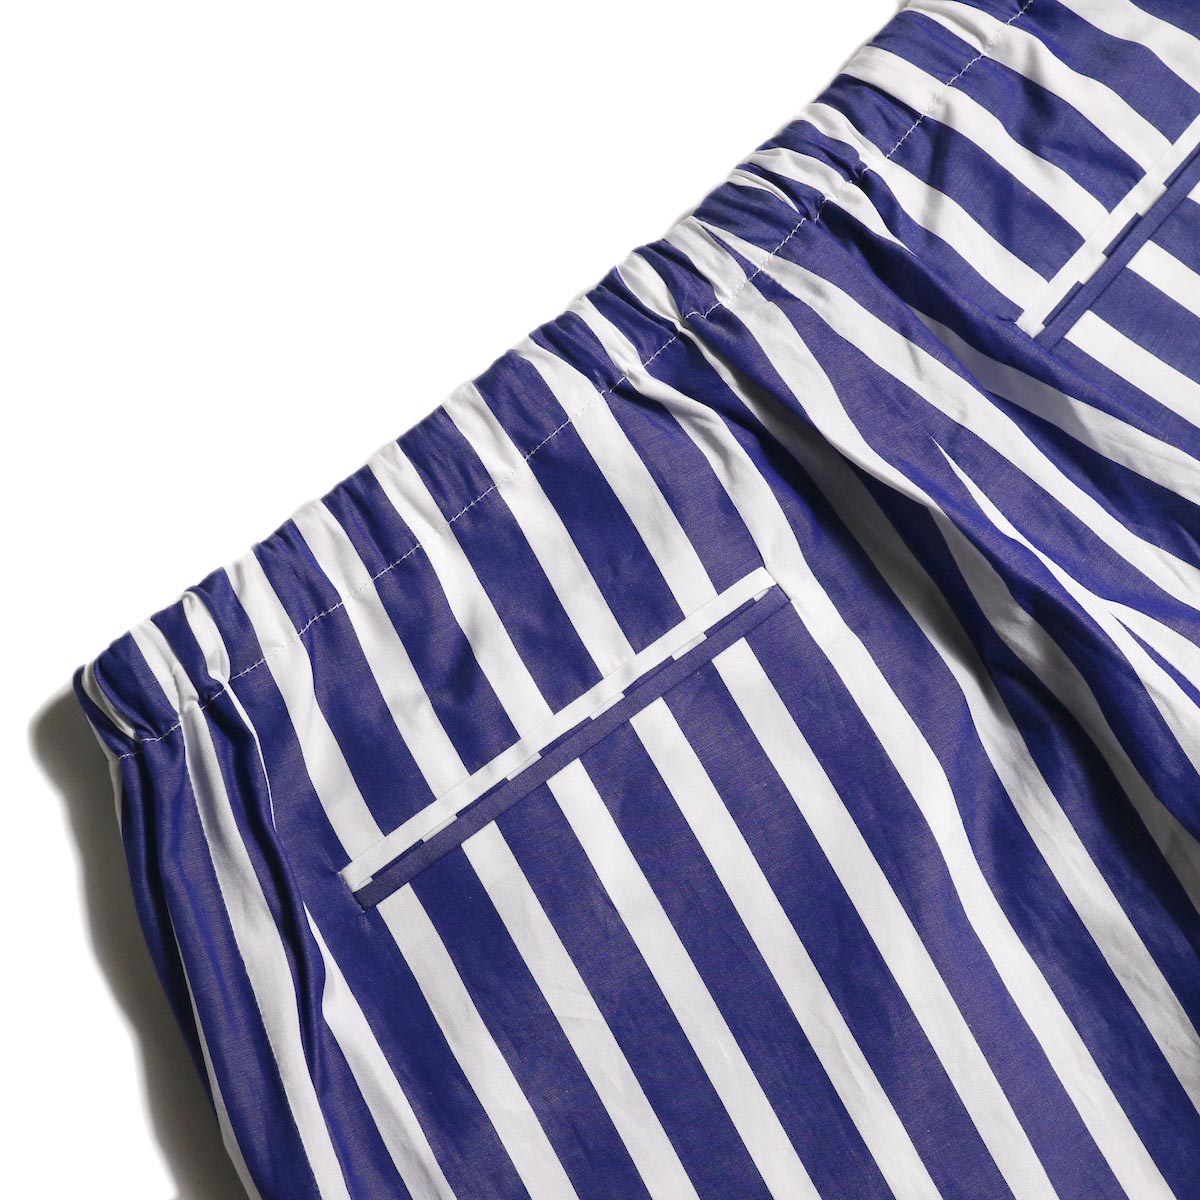 FUTURE PRIMITIVE / FP LOUNGE SHORTS (Candy Stripe)ヒップポケット